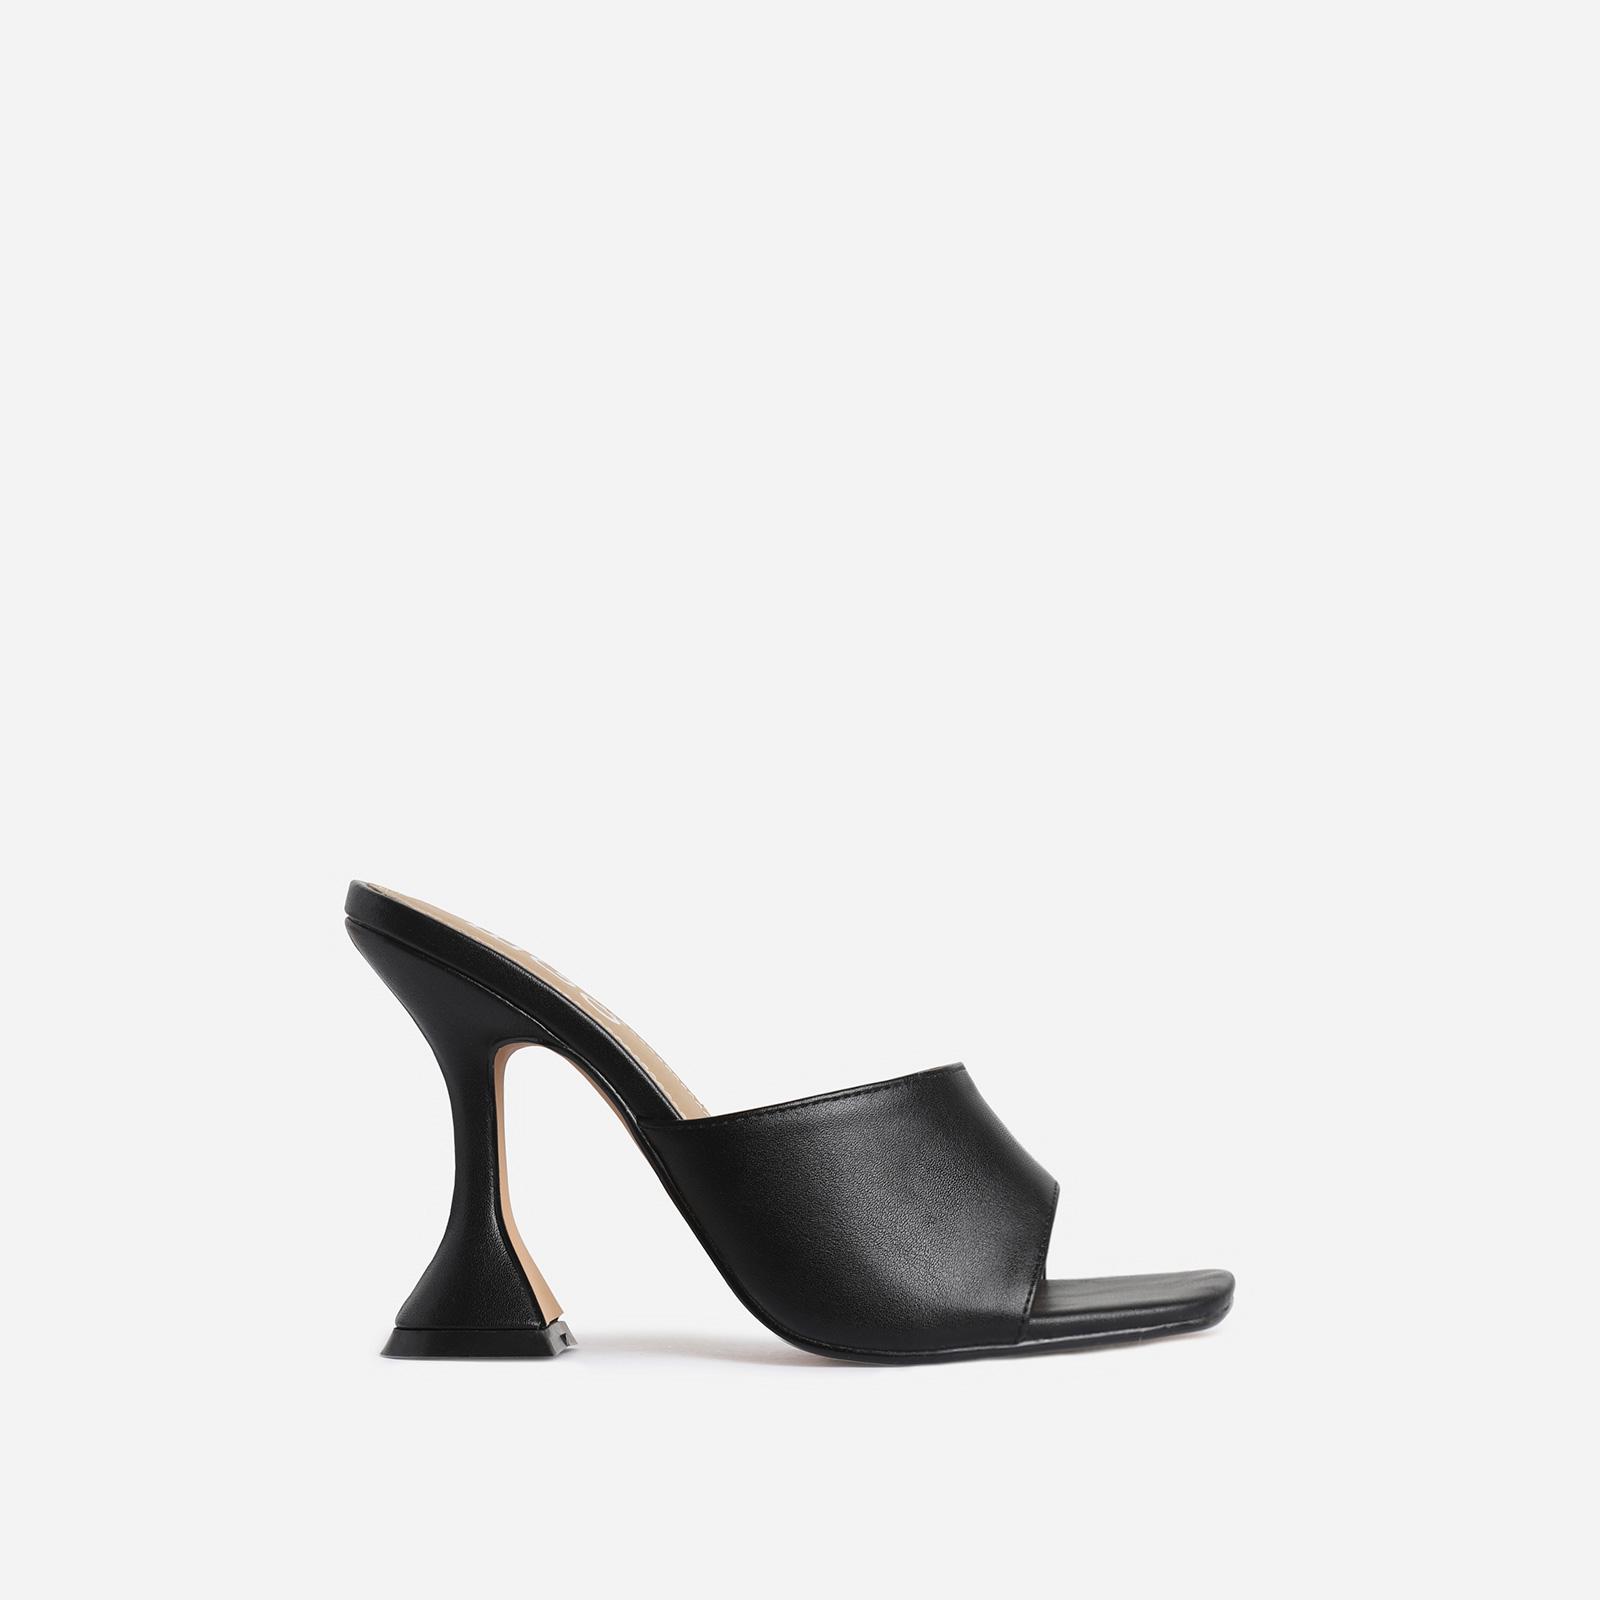 Jordi Peep Square Toe Heel Mule In Black Faux Leather